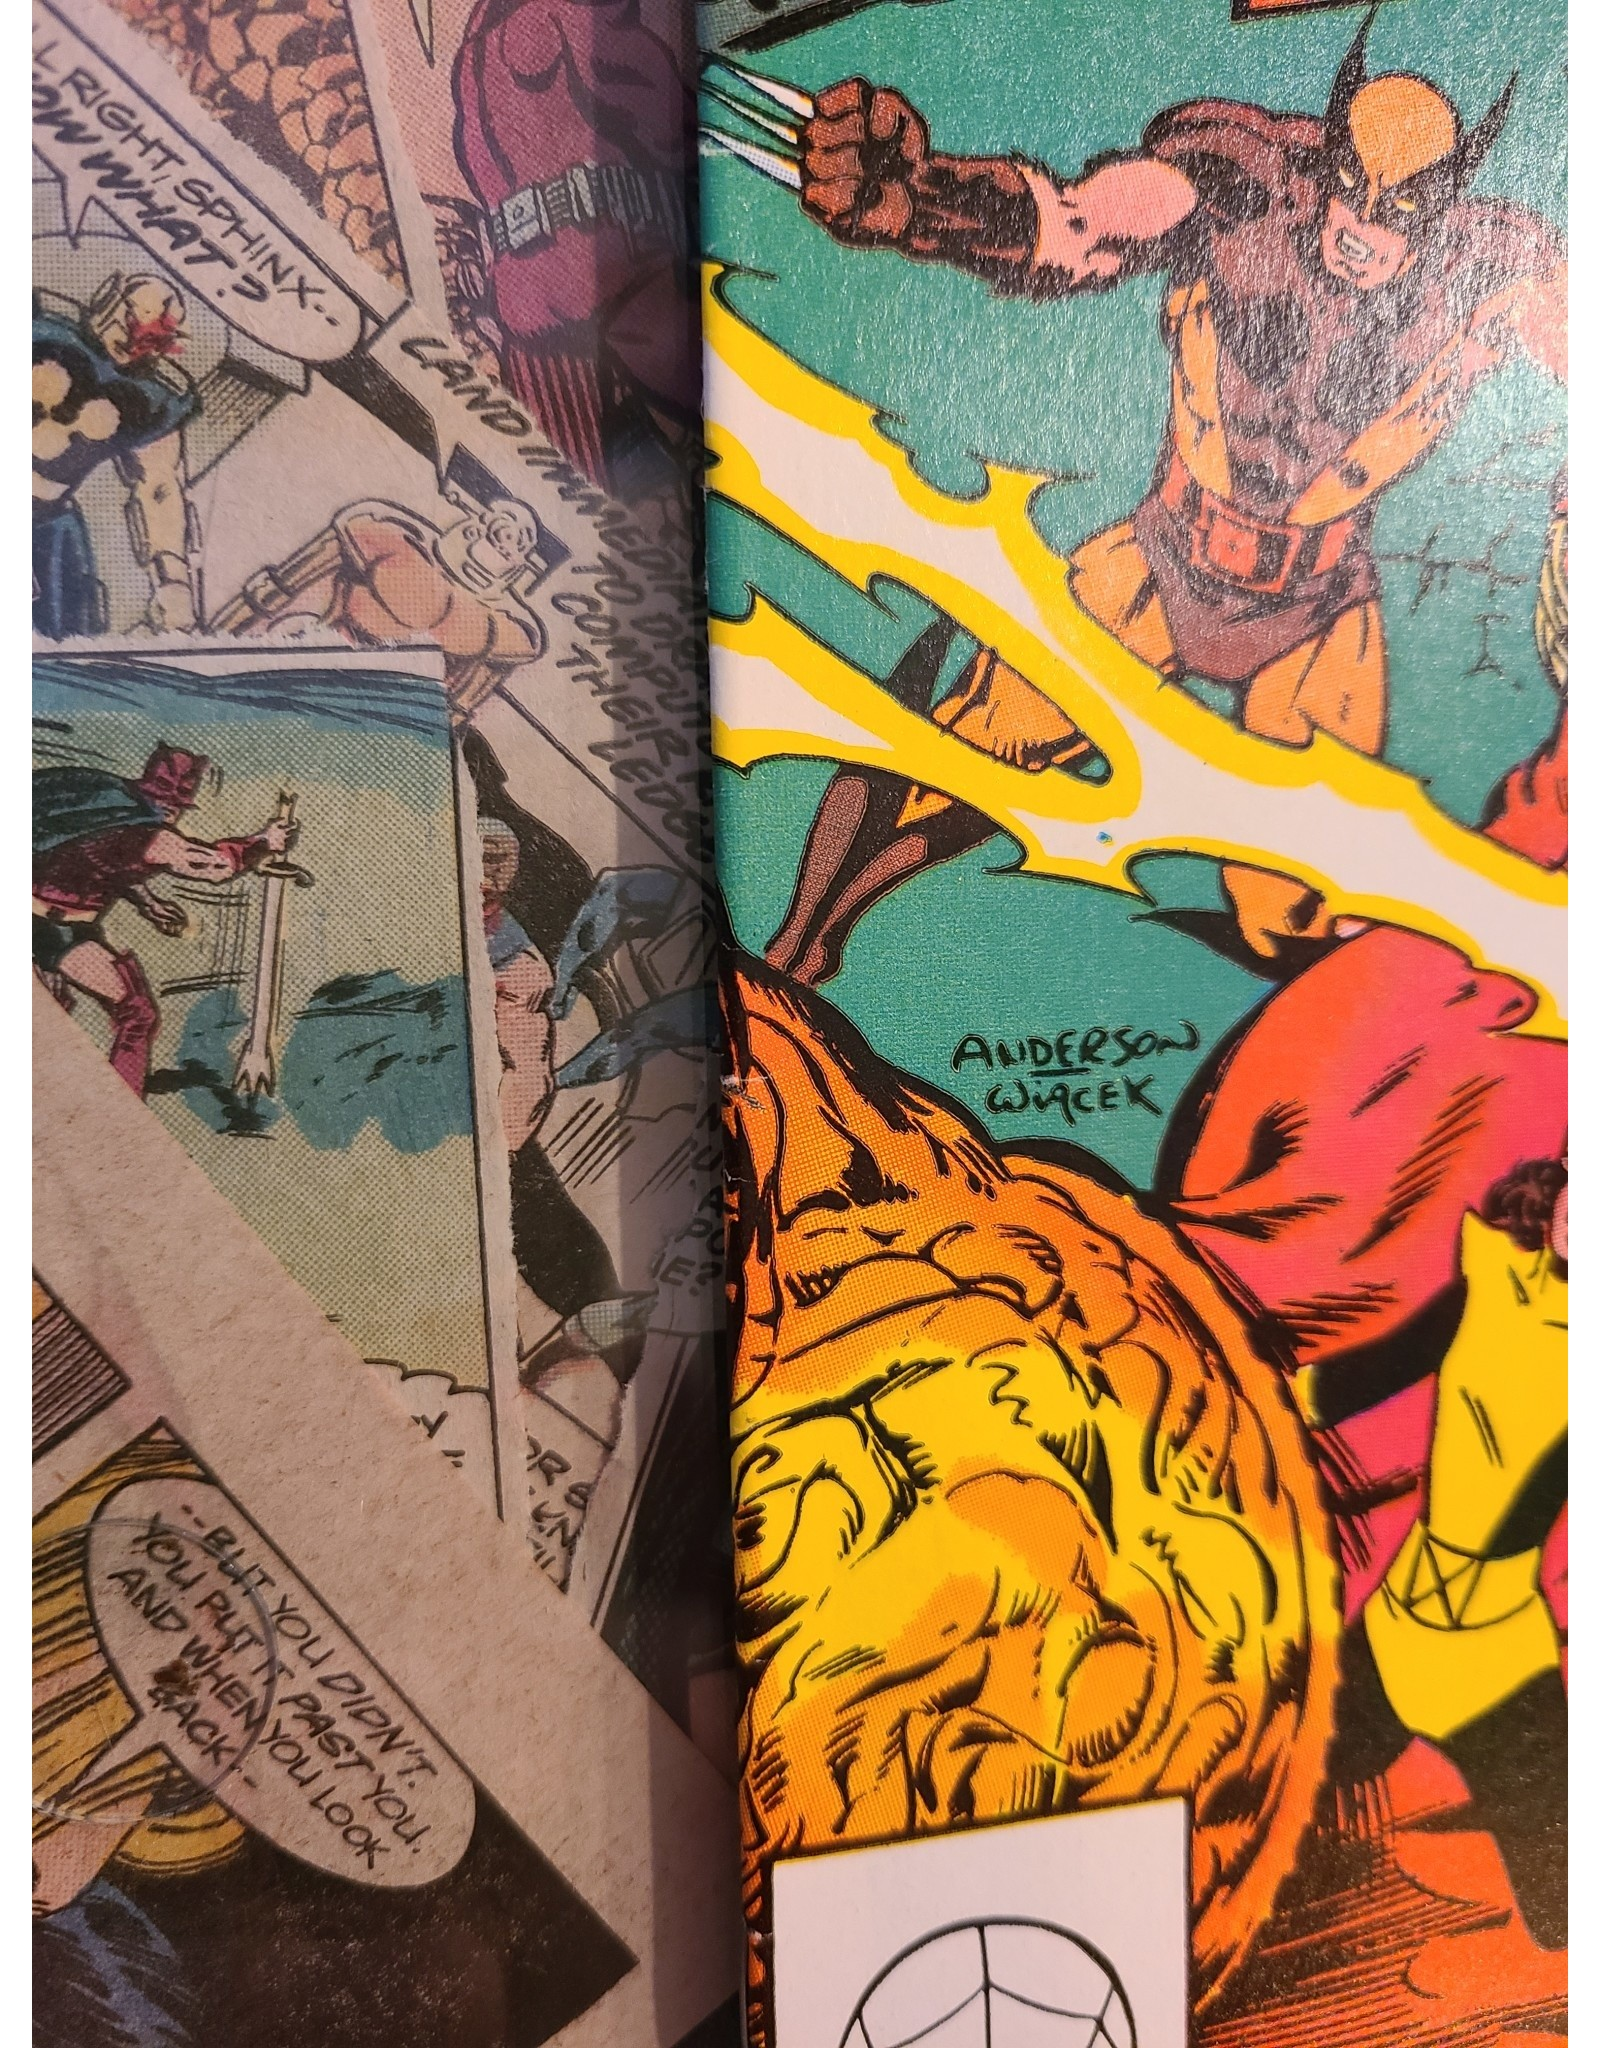 Marvel Comics UNCANNY X-MEN #160 1ST ILLYANA RASPUTIN VF